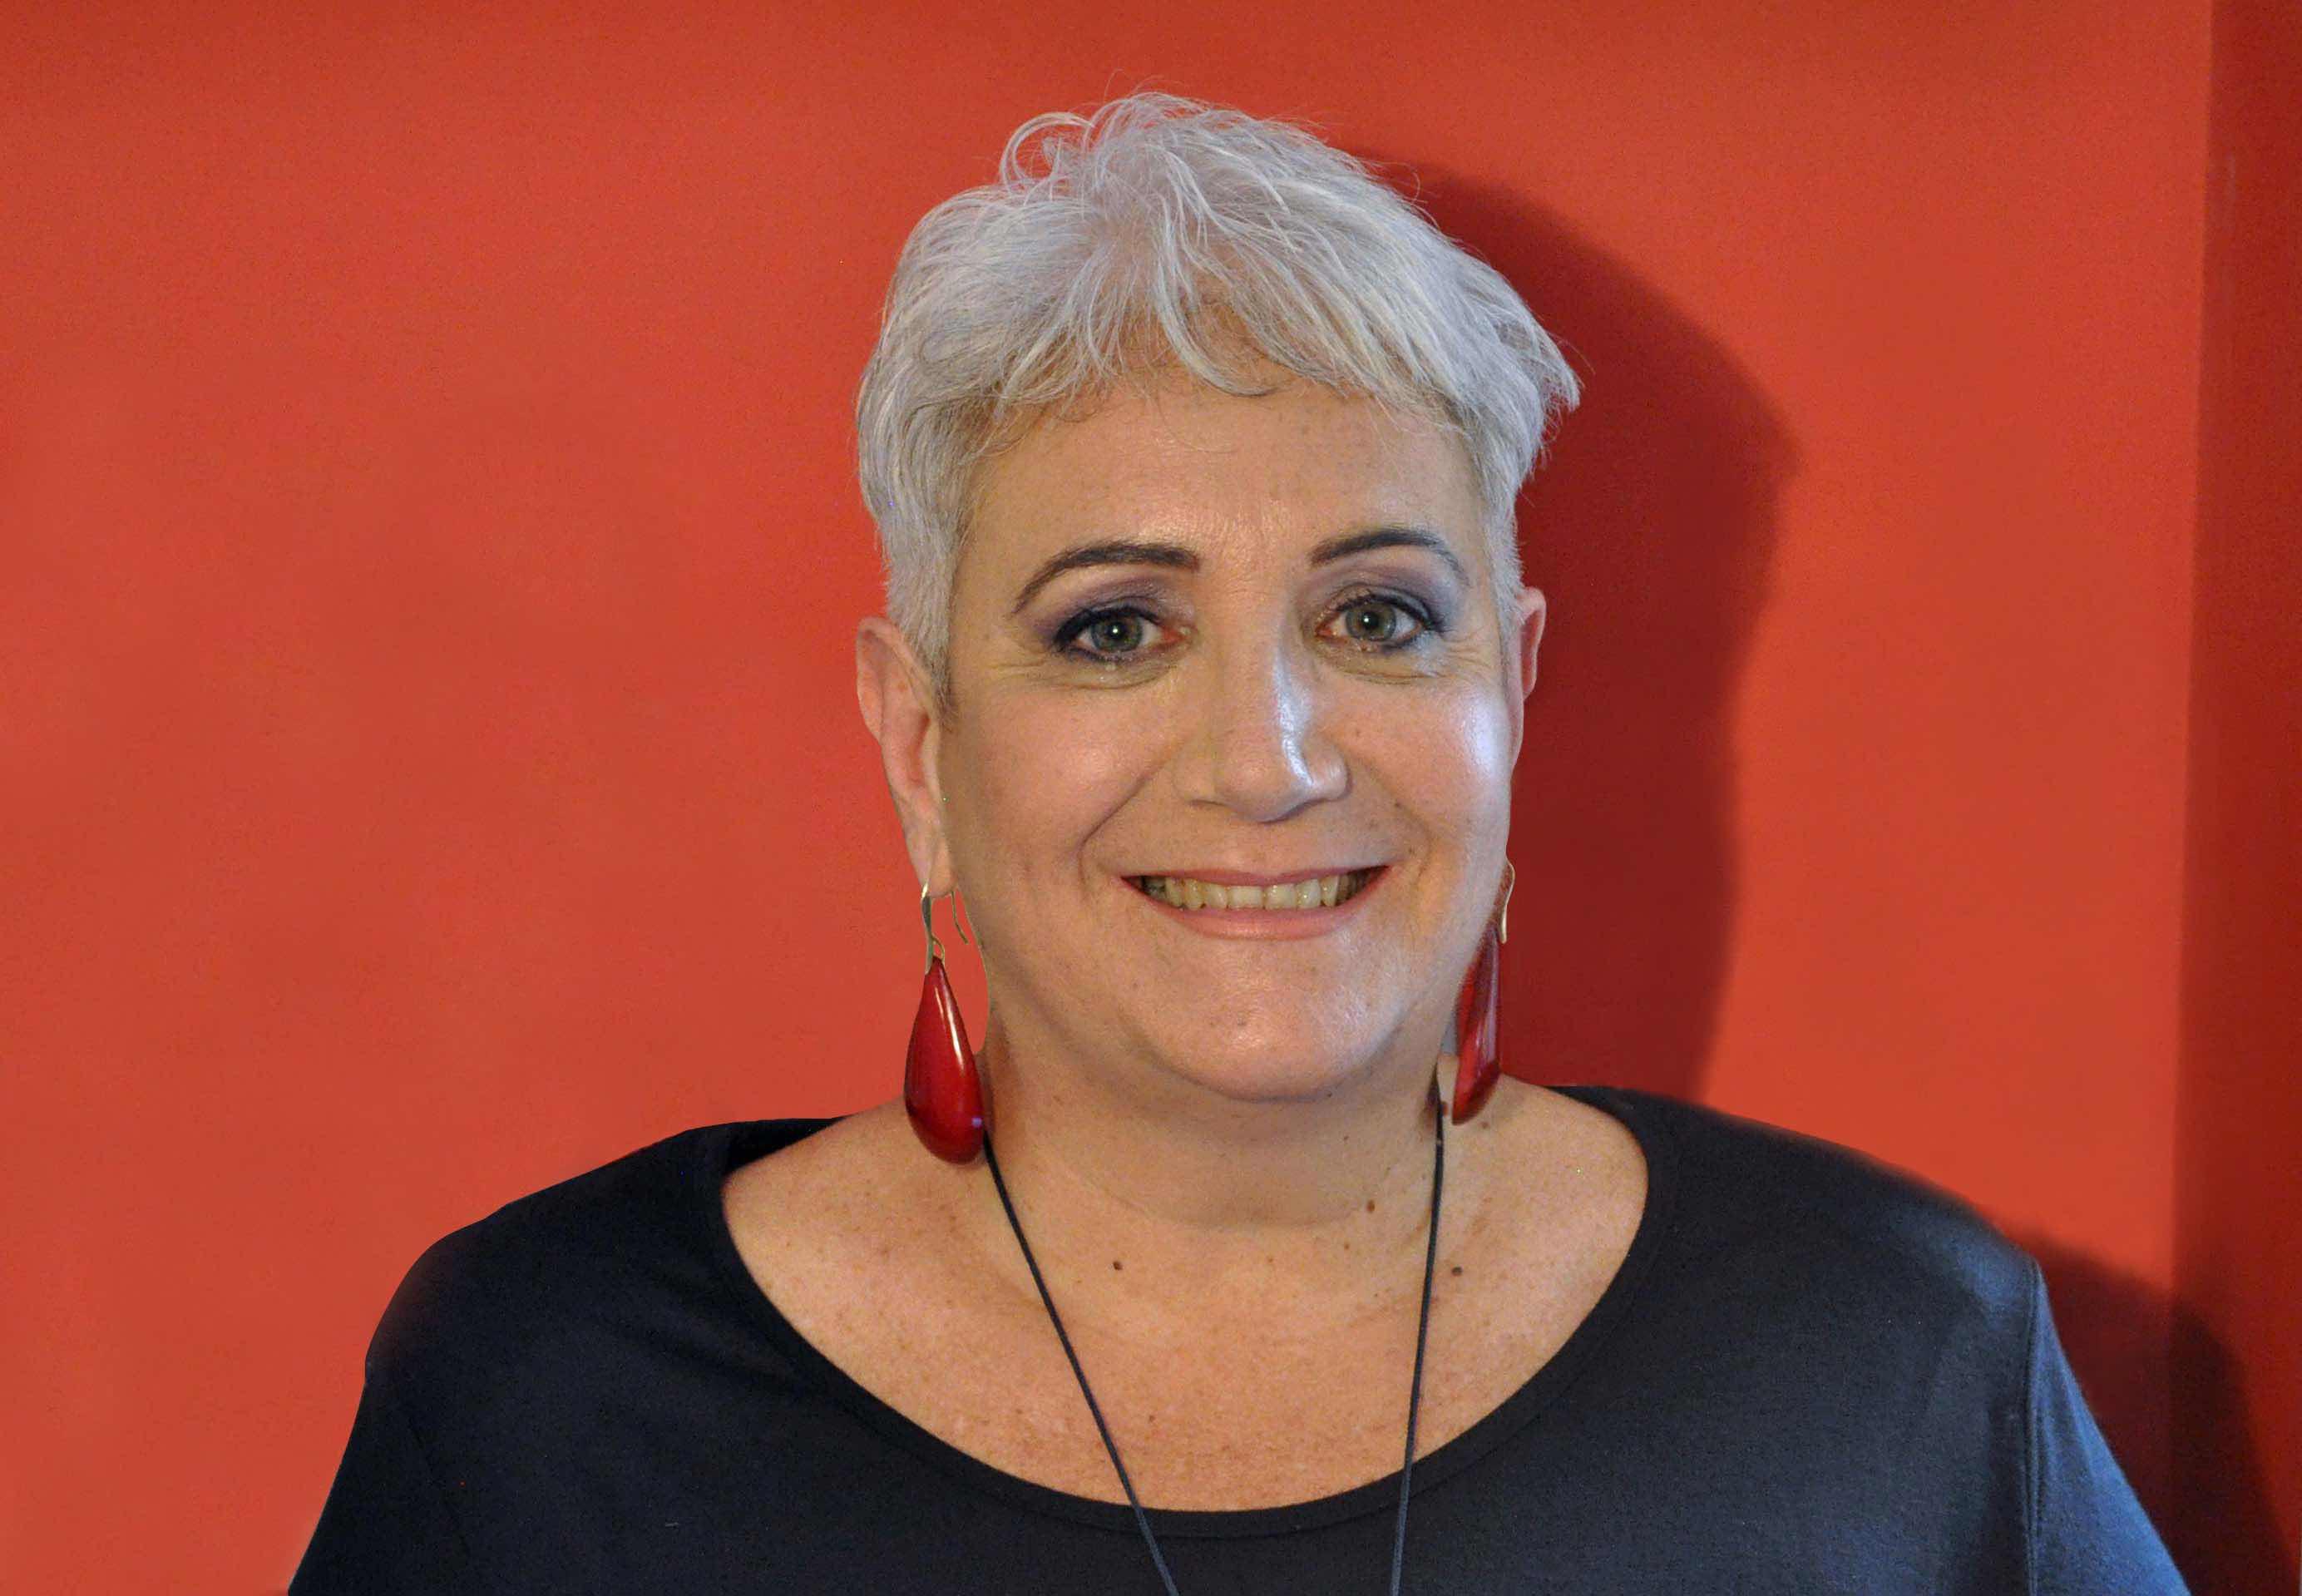 Dott. Elena Dragotto